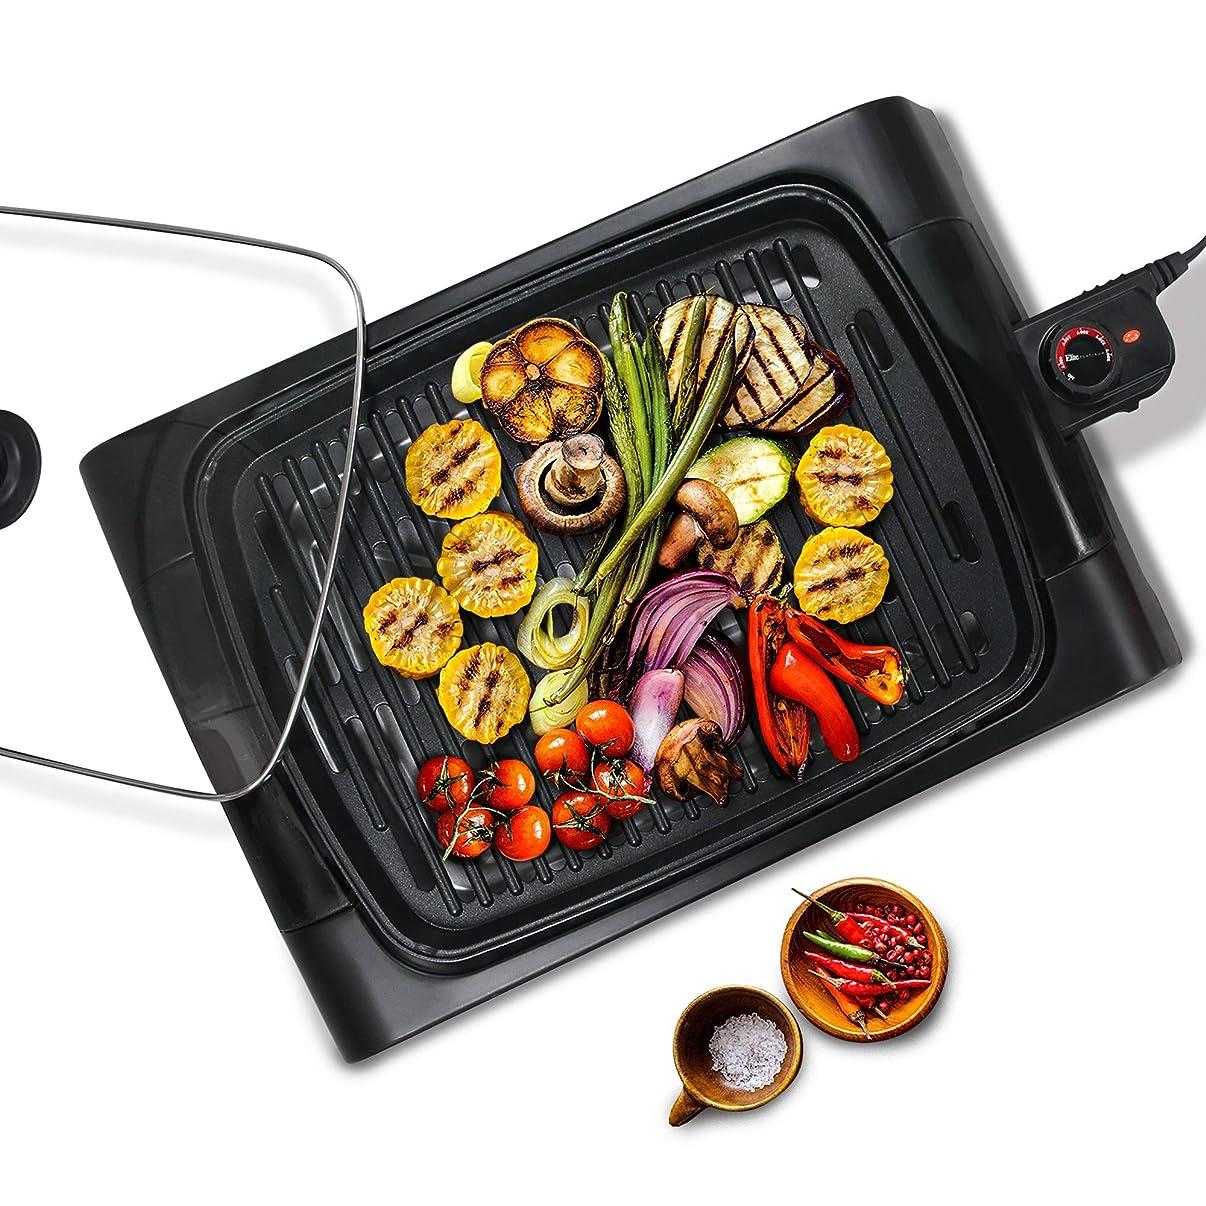 "Elite Platinum EGL-6501 XL Indoor Electric Grill, Nonstick Grilling Surface, Faster Heat Up, Ideal For Meat, Fish, Vegetables & Low-Fat Meals, Easy To Clean Design, 16"" x 12"", Dishwasher Safe, Black"